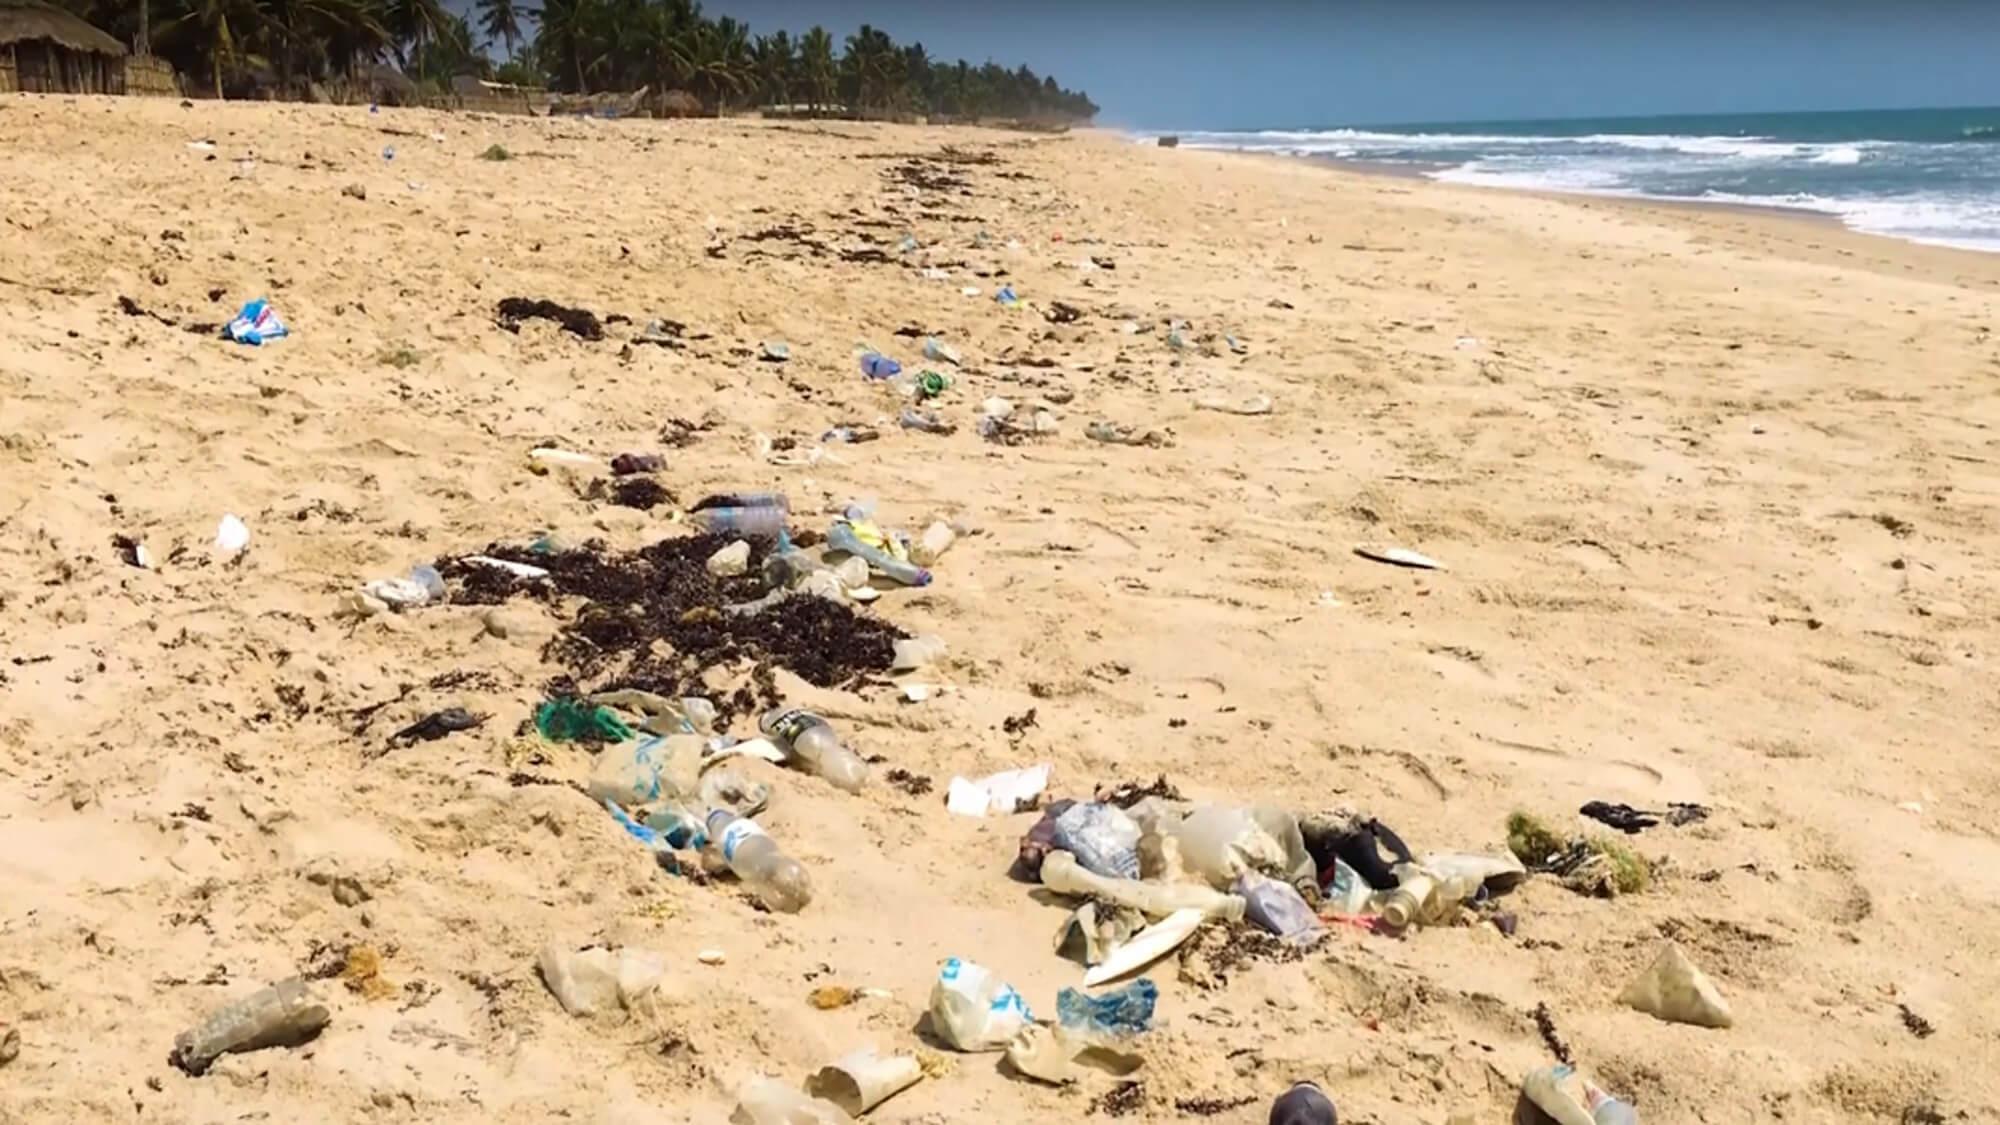 plastic pollution on the beach in Ghana